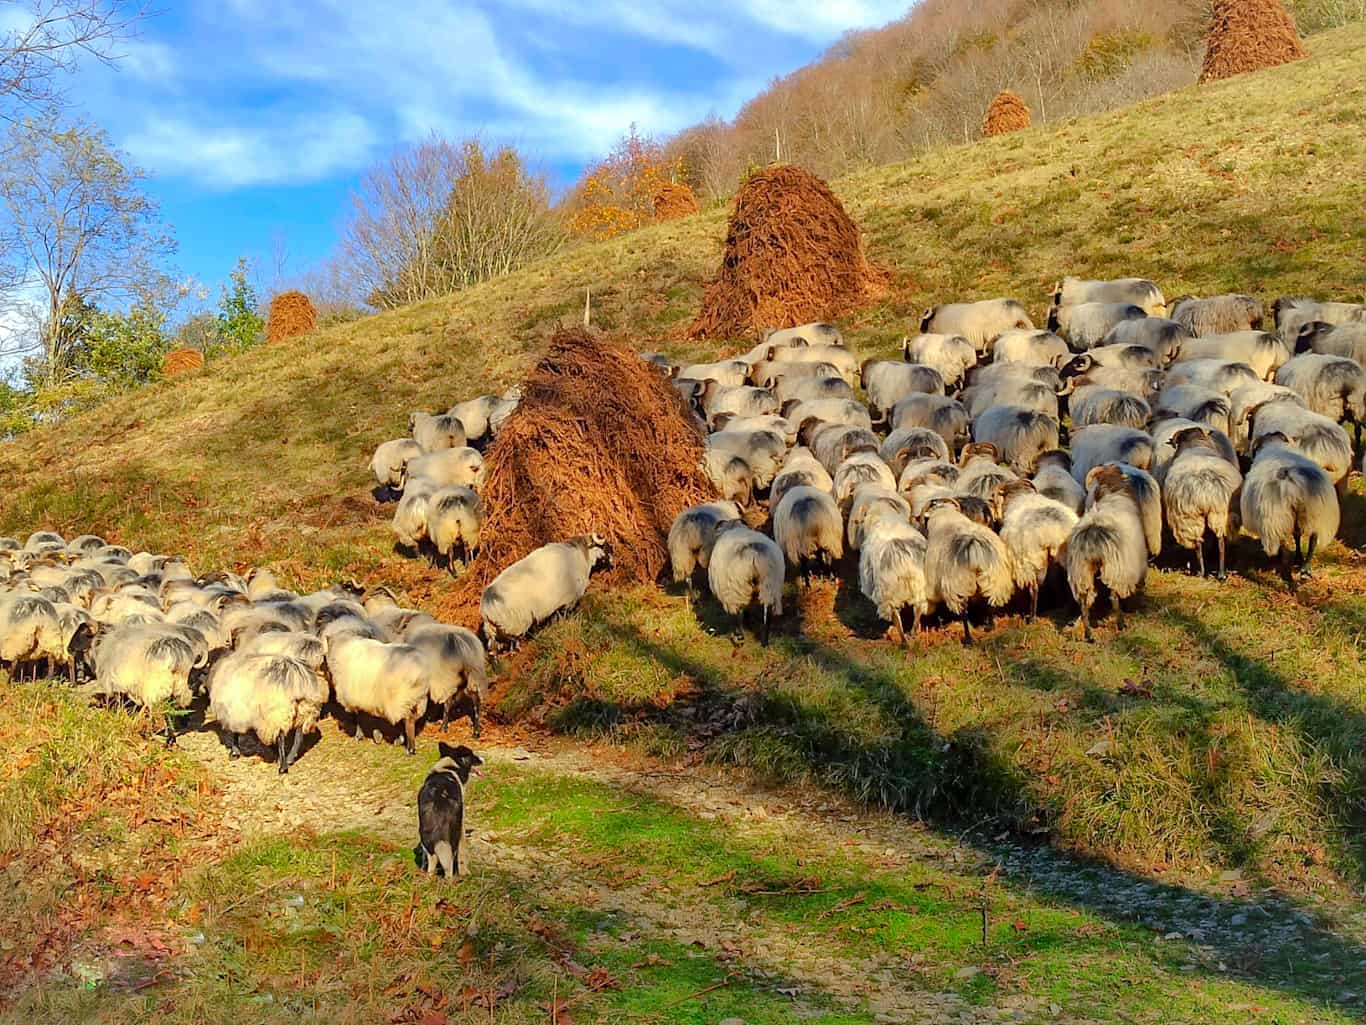 sheepdogs in Ameztia